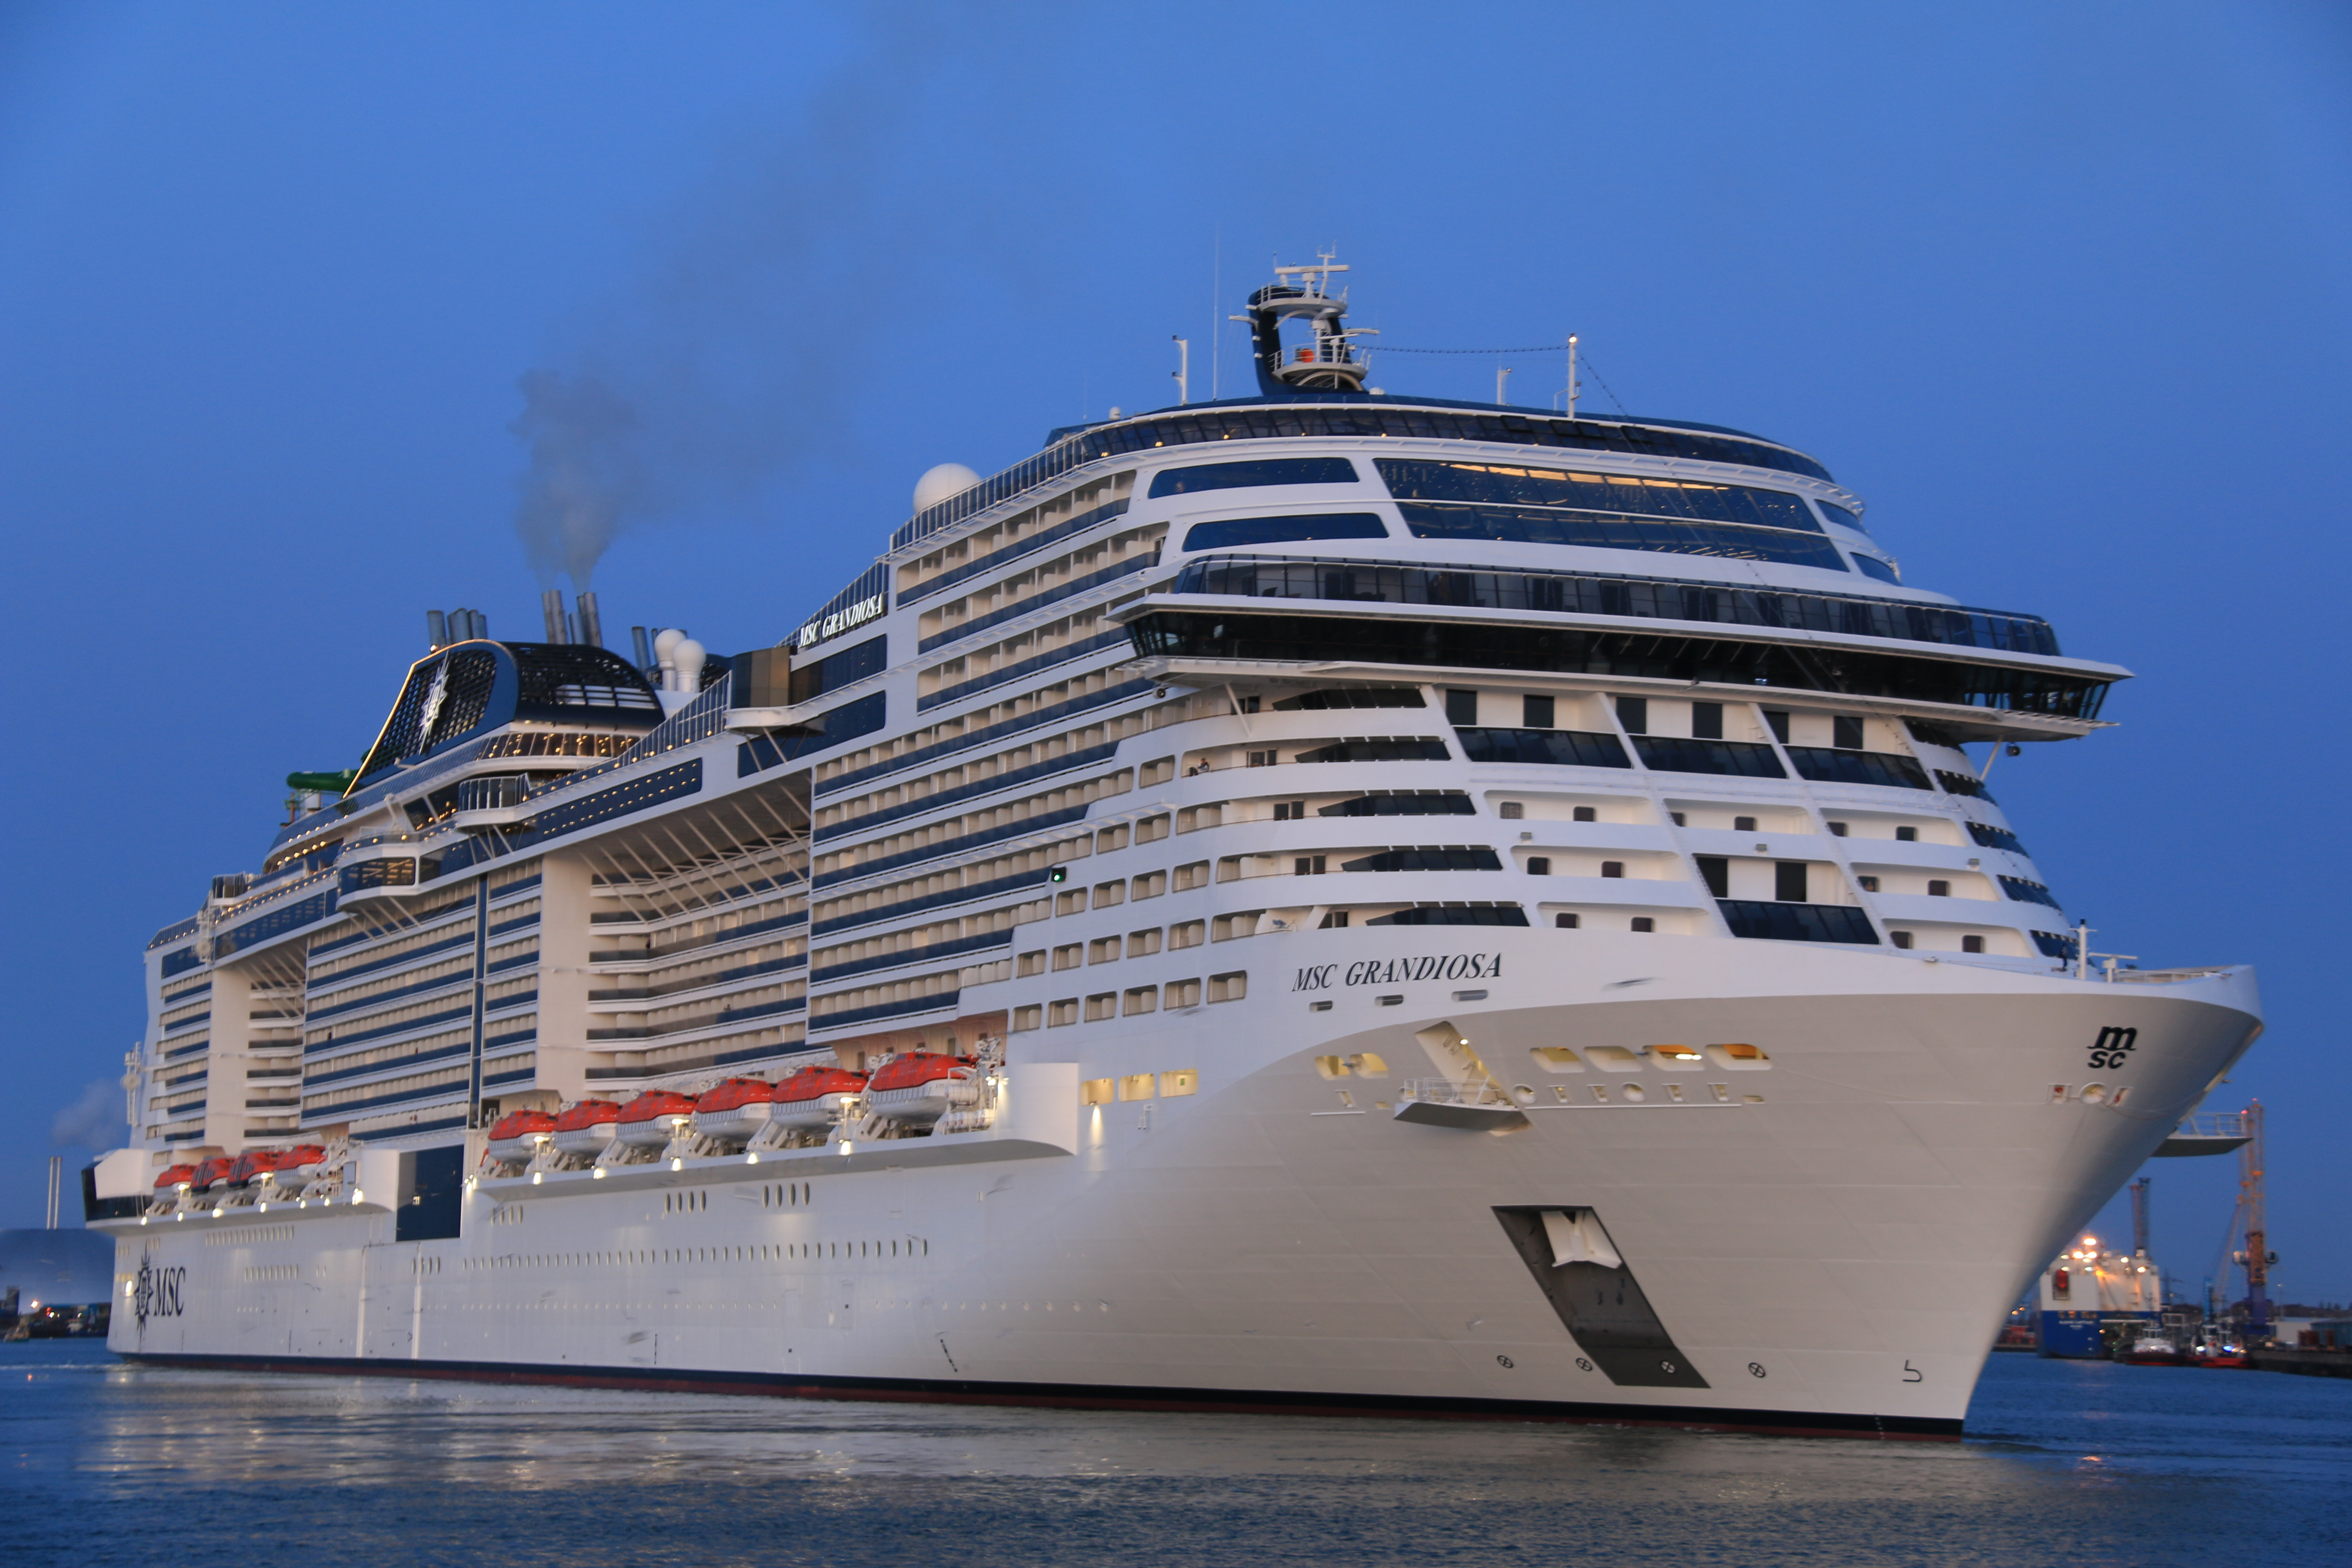 MSC Cruises MSC Grandiosa alongside in Southampton